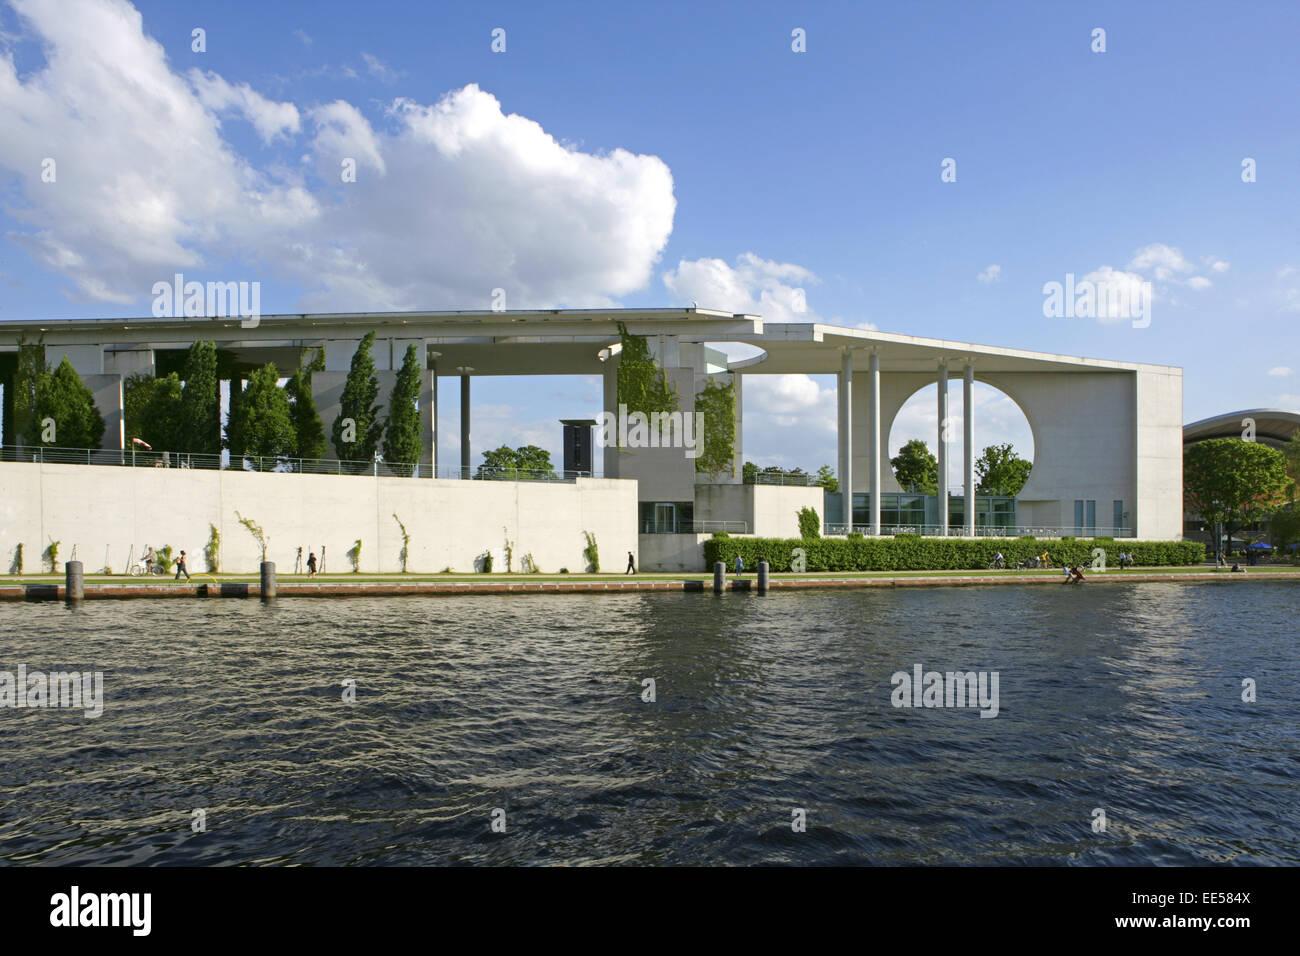 Deutschland, Berlin, Europa, Hauptstadt, Stadt, Sehenswuerdigkeit, Berlin-Tiergarten, neues Bundeskanzleramt, Politik, Stock Photo